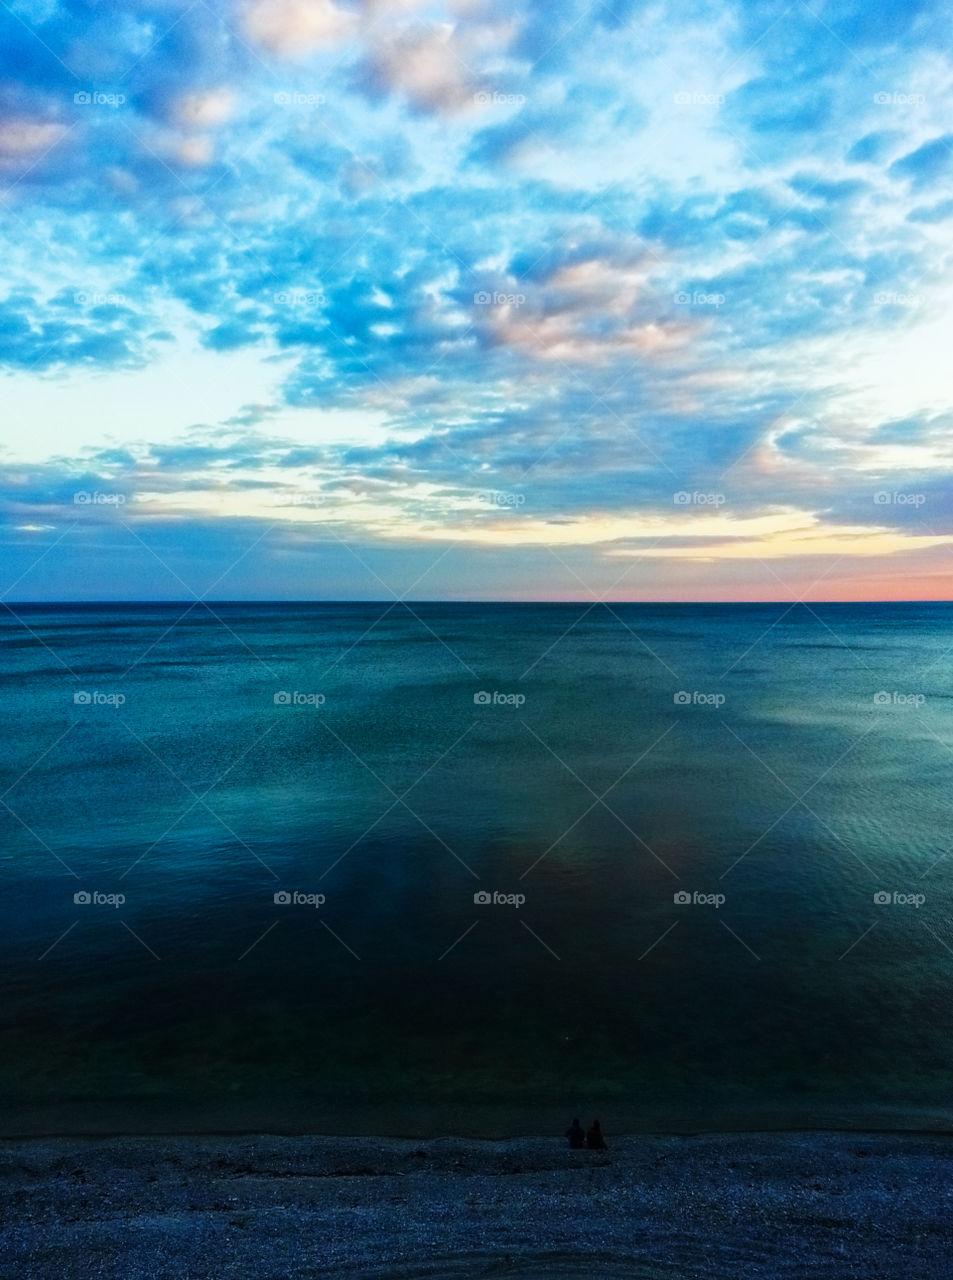 Couple meeting dramatic sunset near ocean